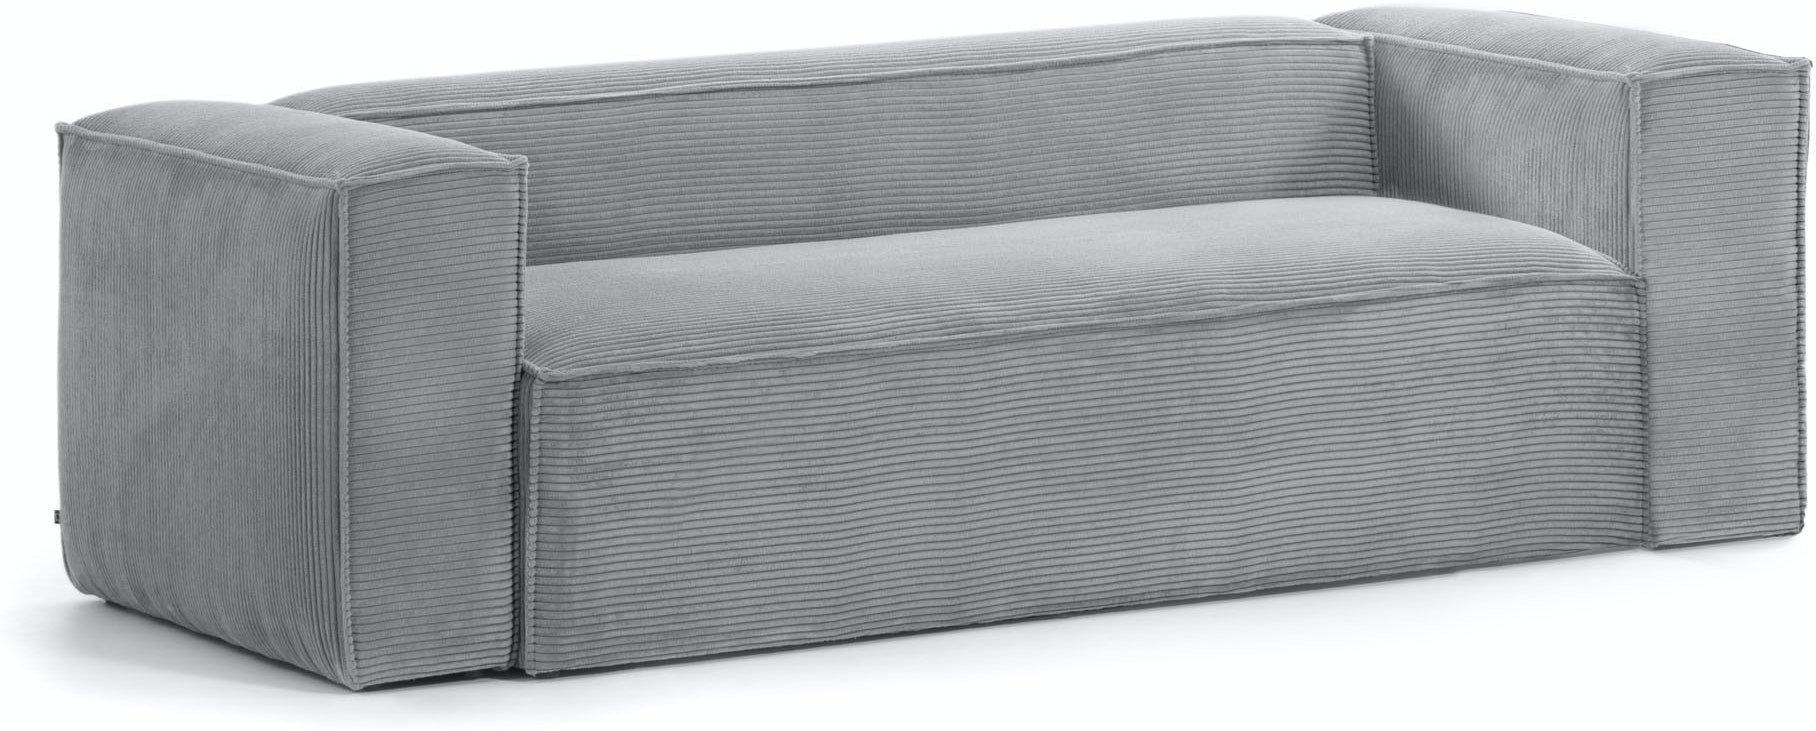 Blok, 3-personers sofa, Fjøjl by LaForma (H: 69 cm. B: 240 cm. L: 100 cm., Grå)